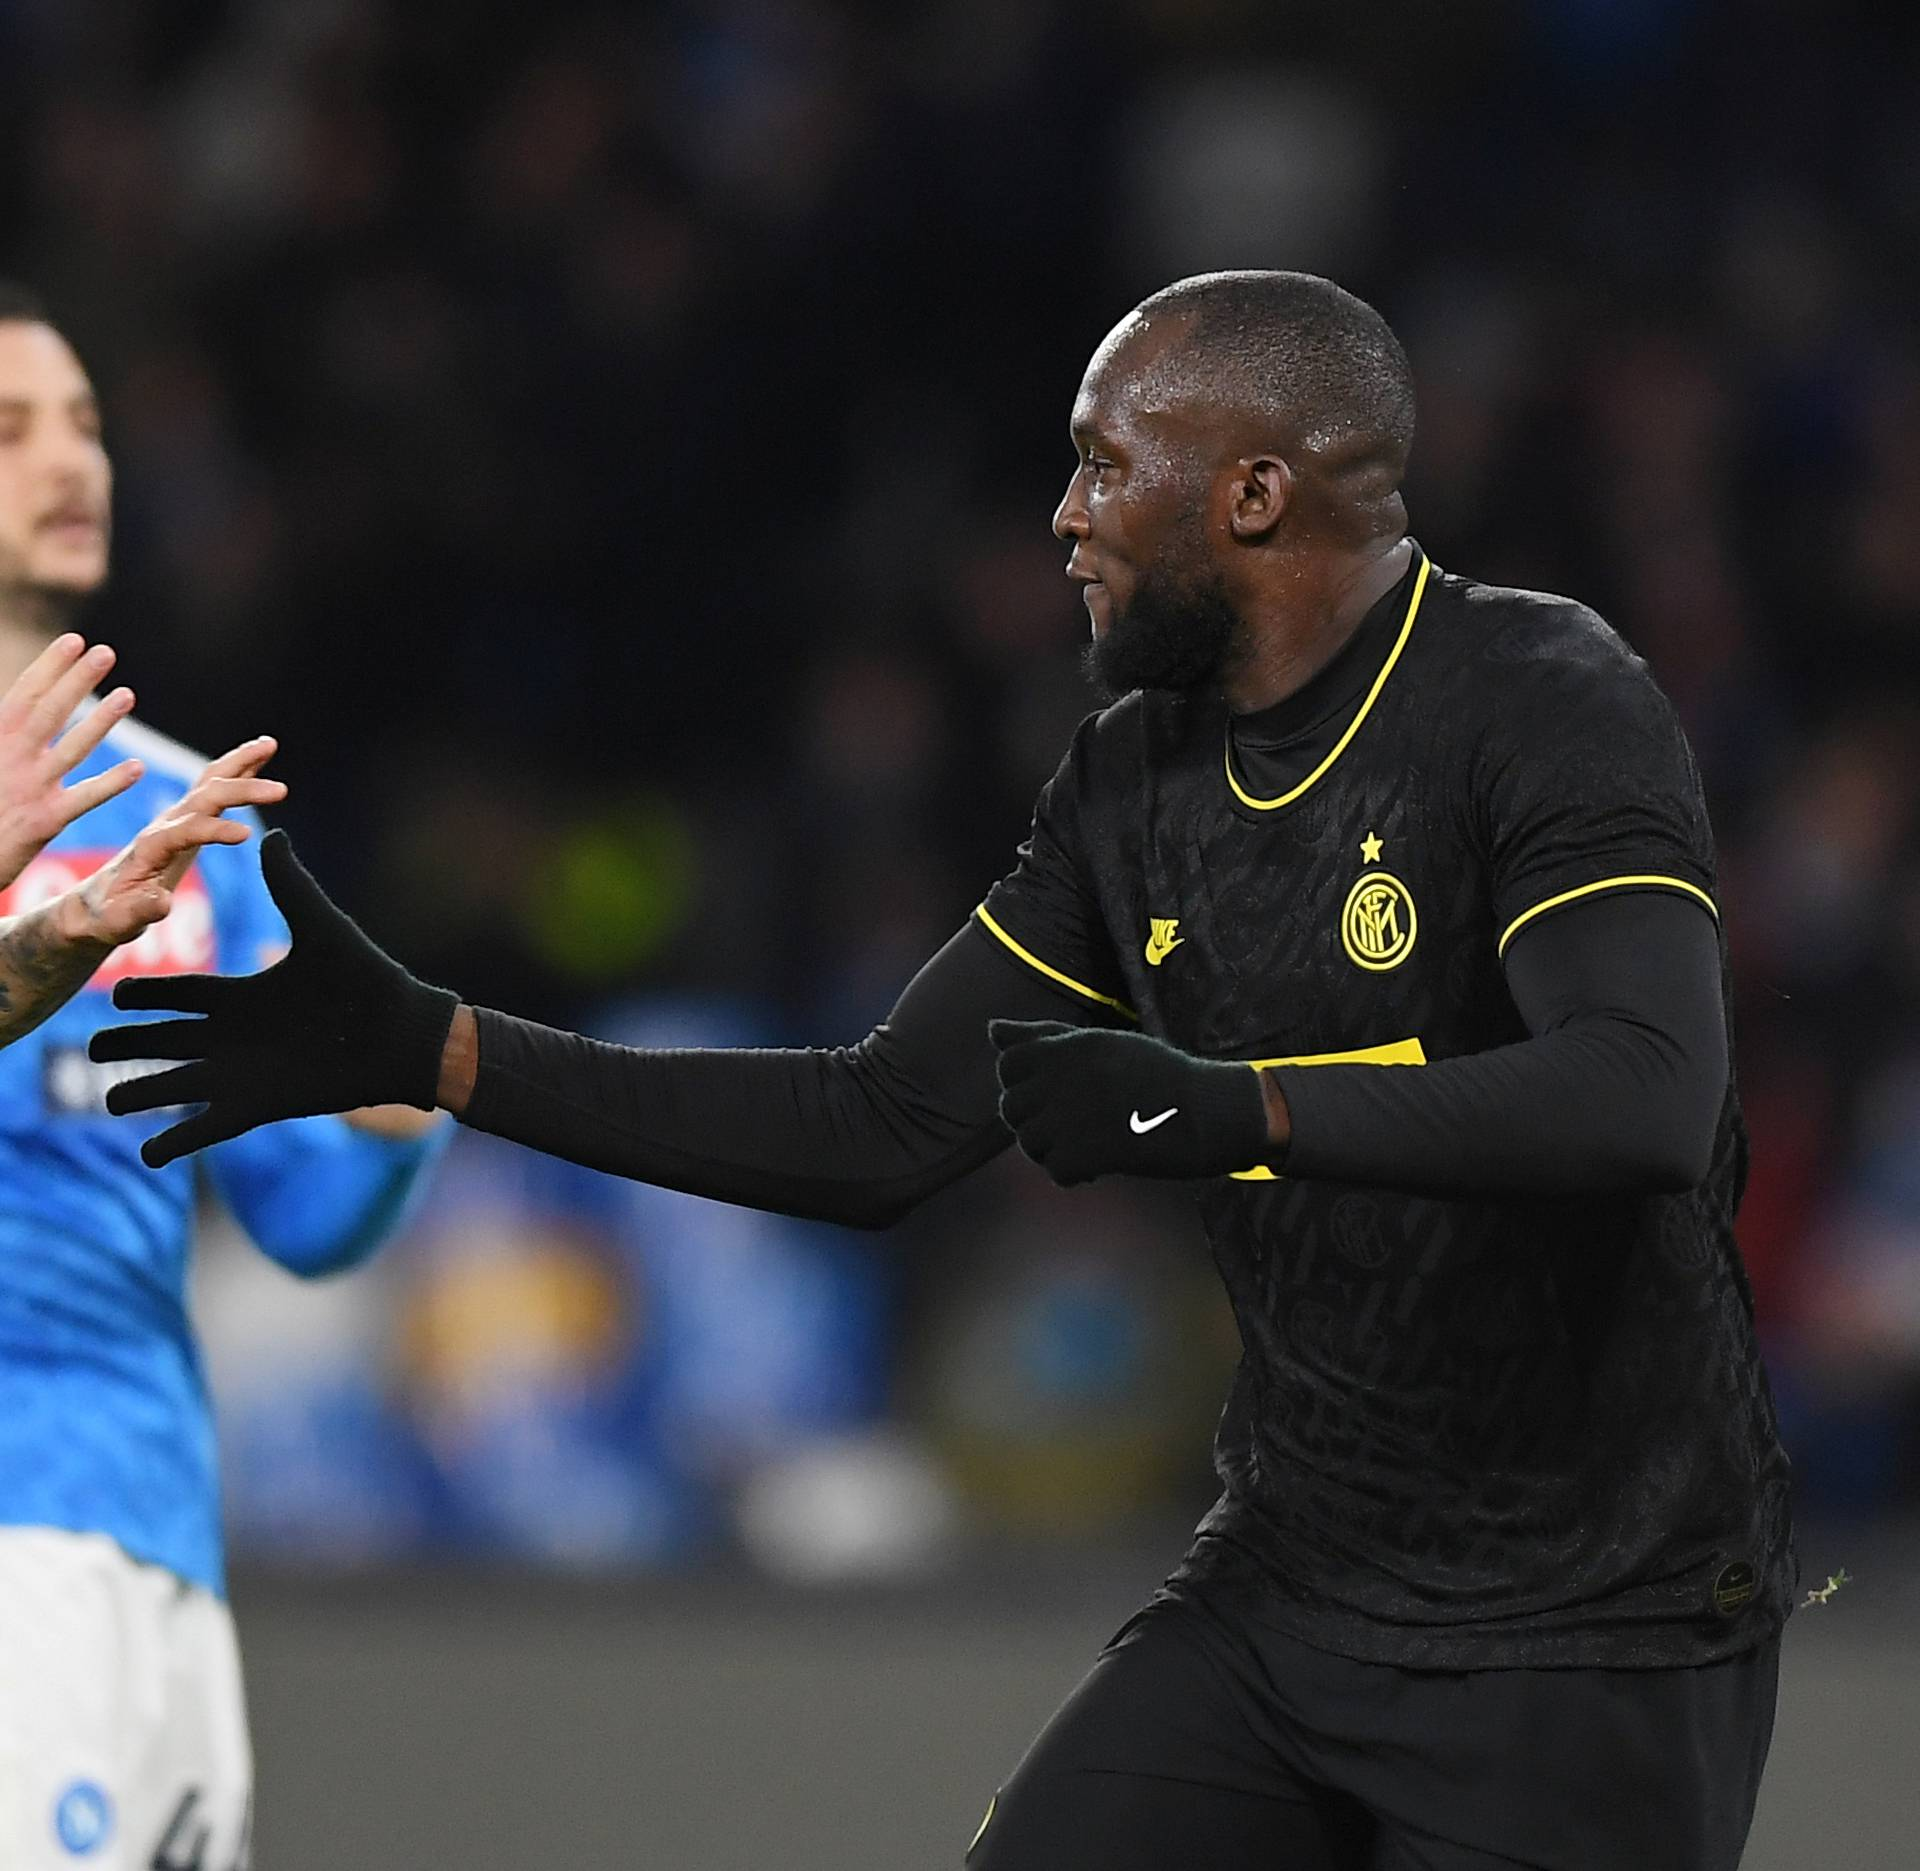 Serie A - Napoli v Inter Milan